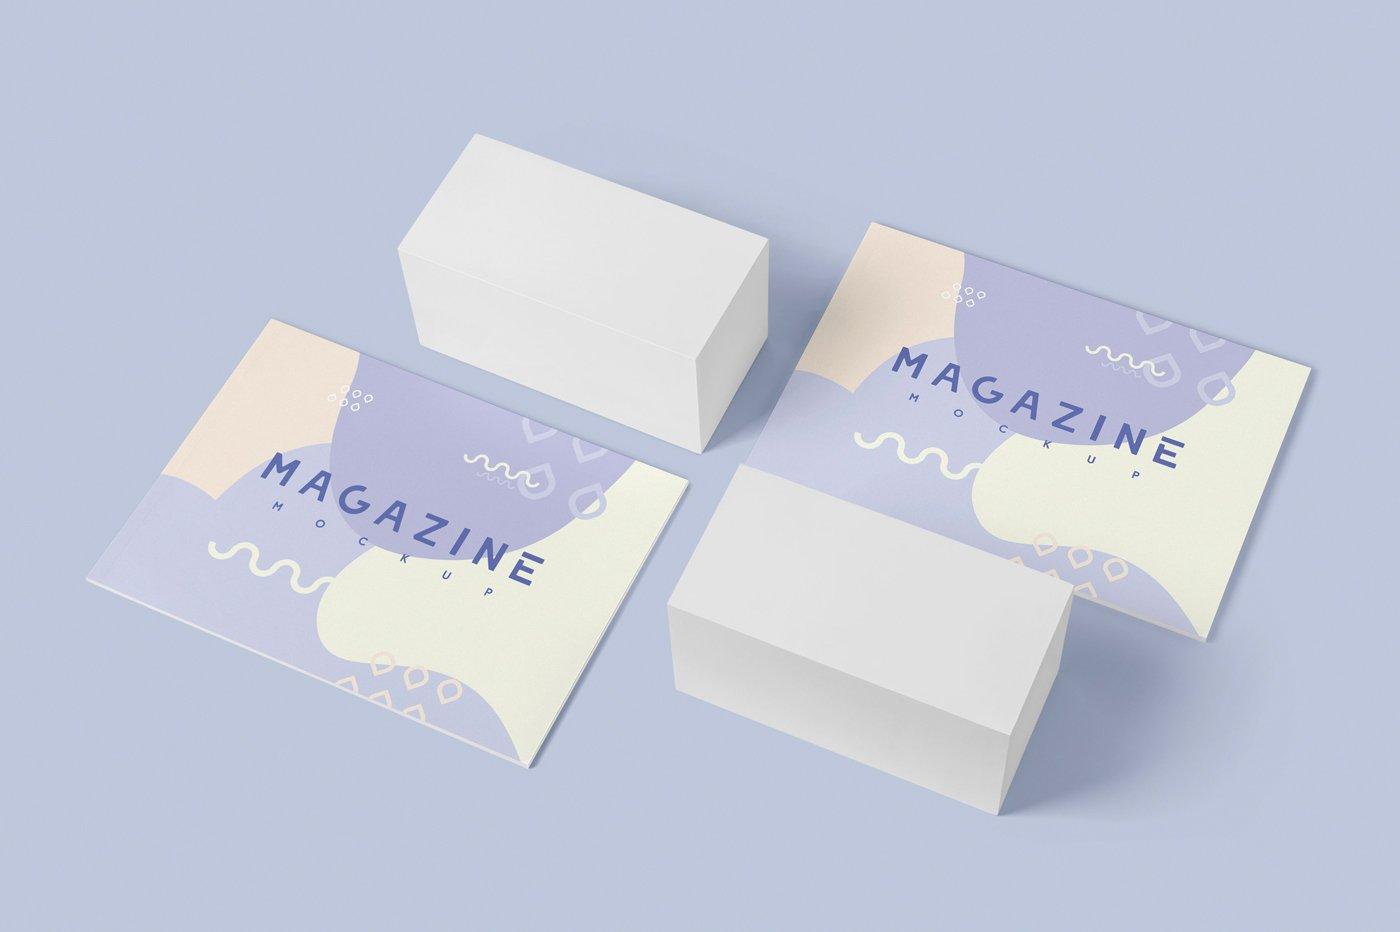 A4横版宣传画册设计展示样机 A4 Horizontal Brochure Mockups插图(2)